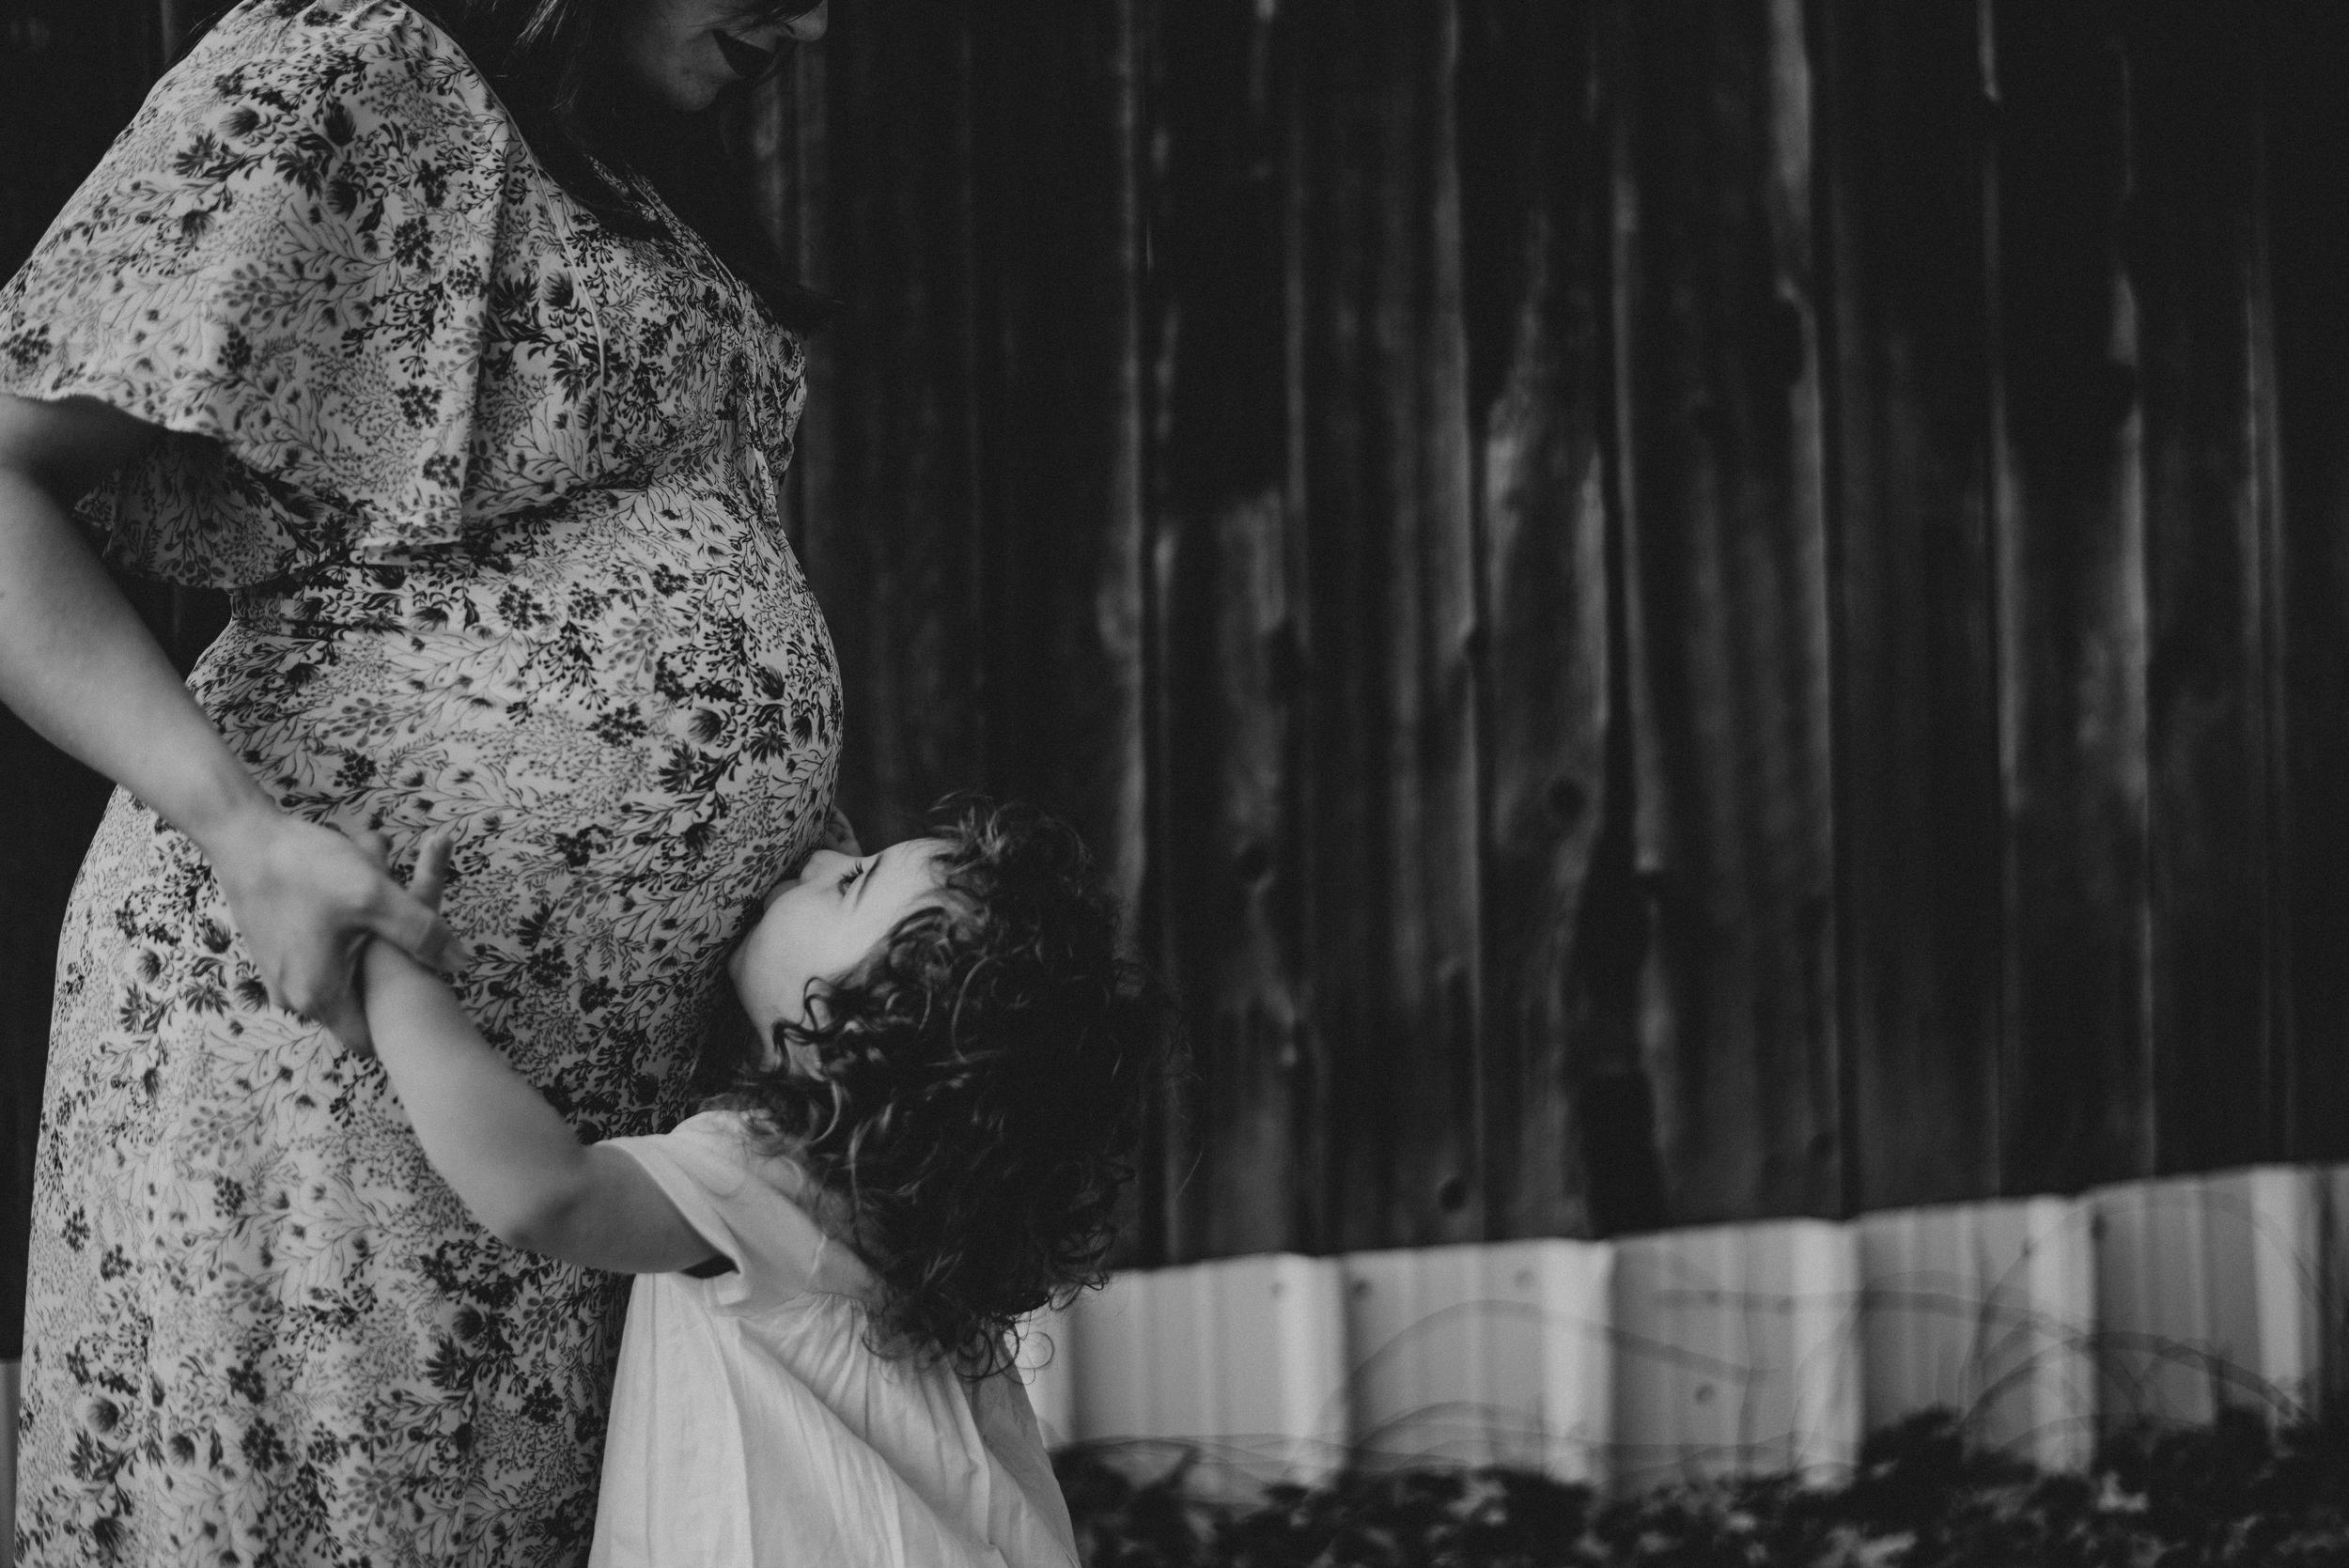 Megan Fuss Photography Maternity Family Session 00003.jpg